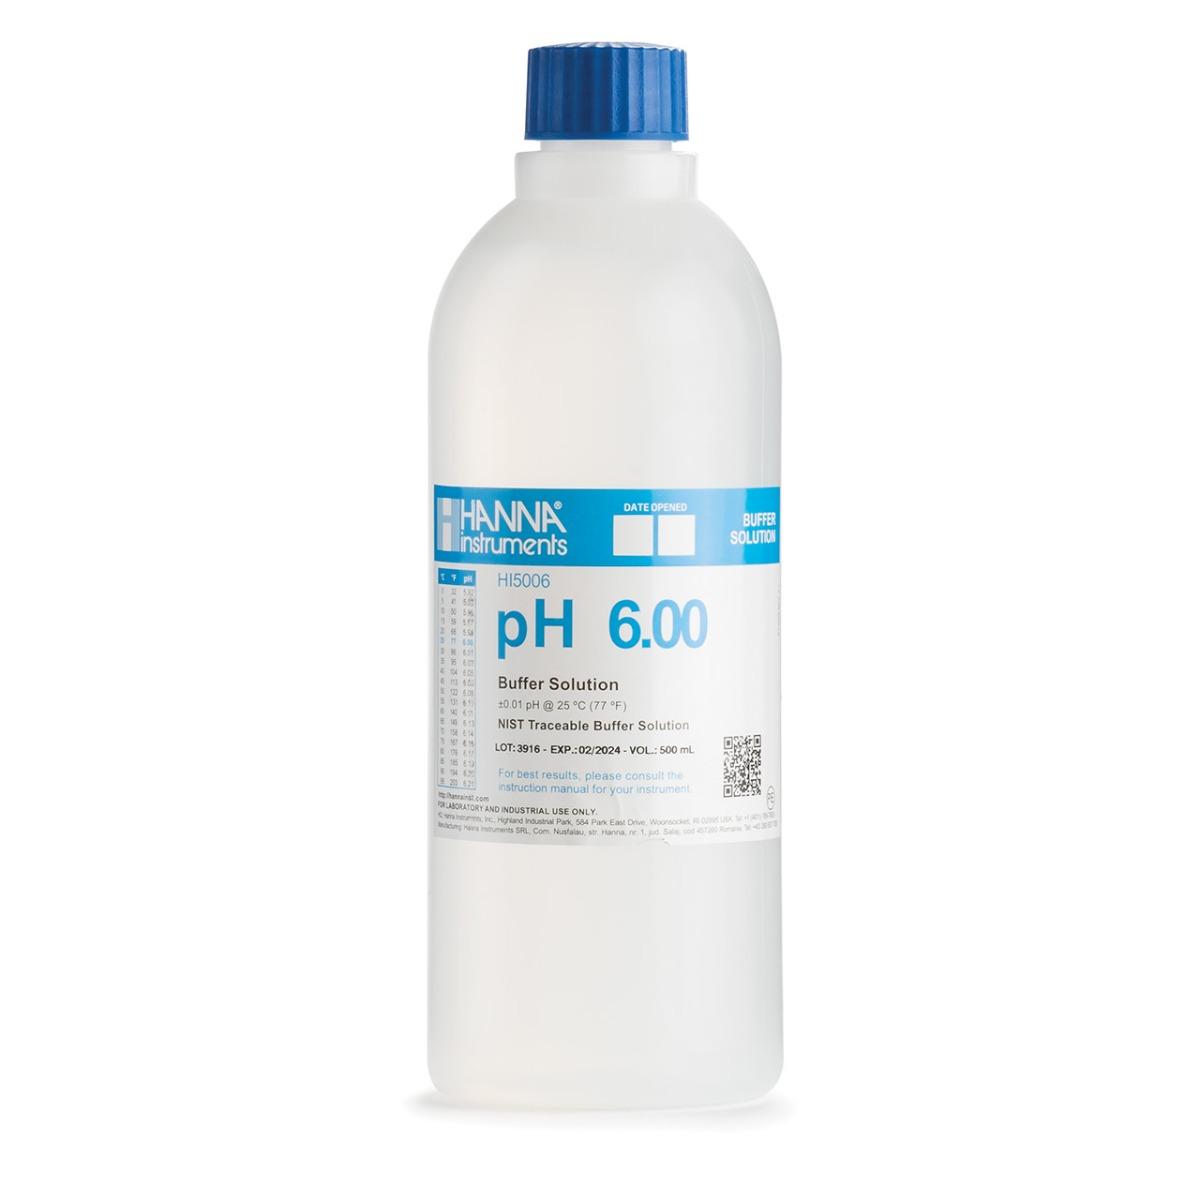 HI5006 pH 6.00 Technical Calibration Buffer (500 mL)